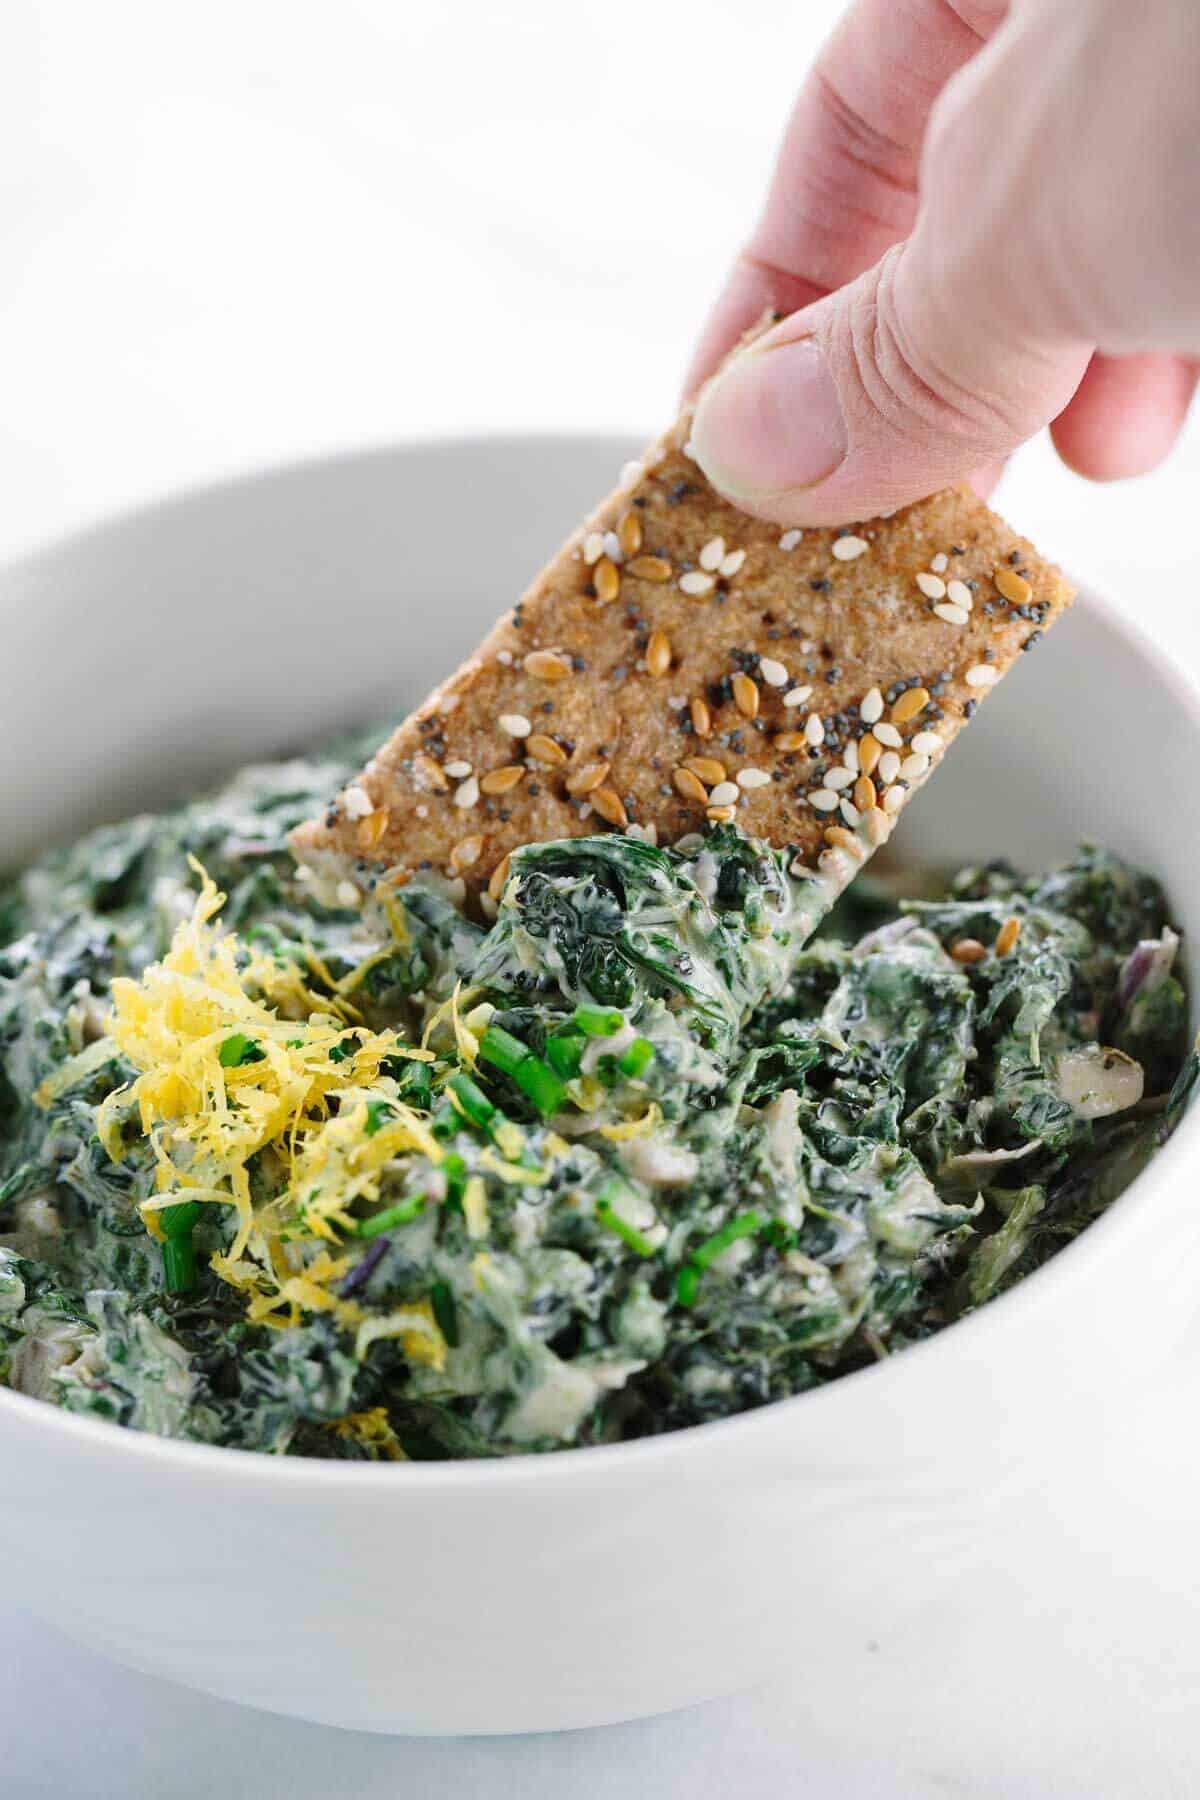 Spinach Kale Yogurt Dip